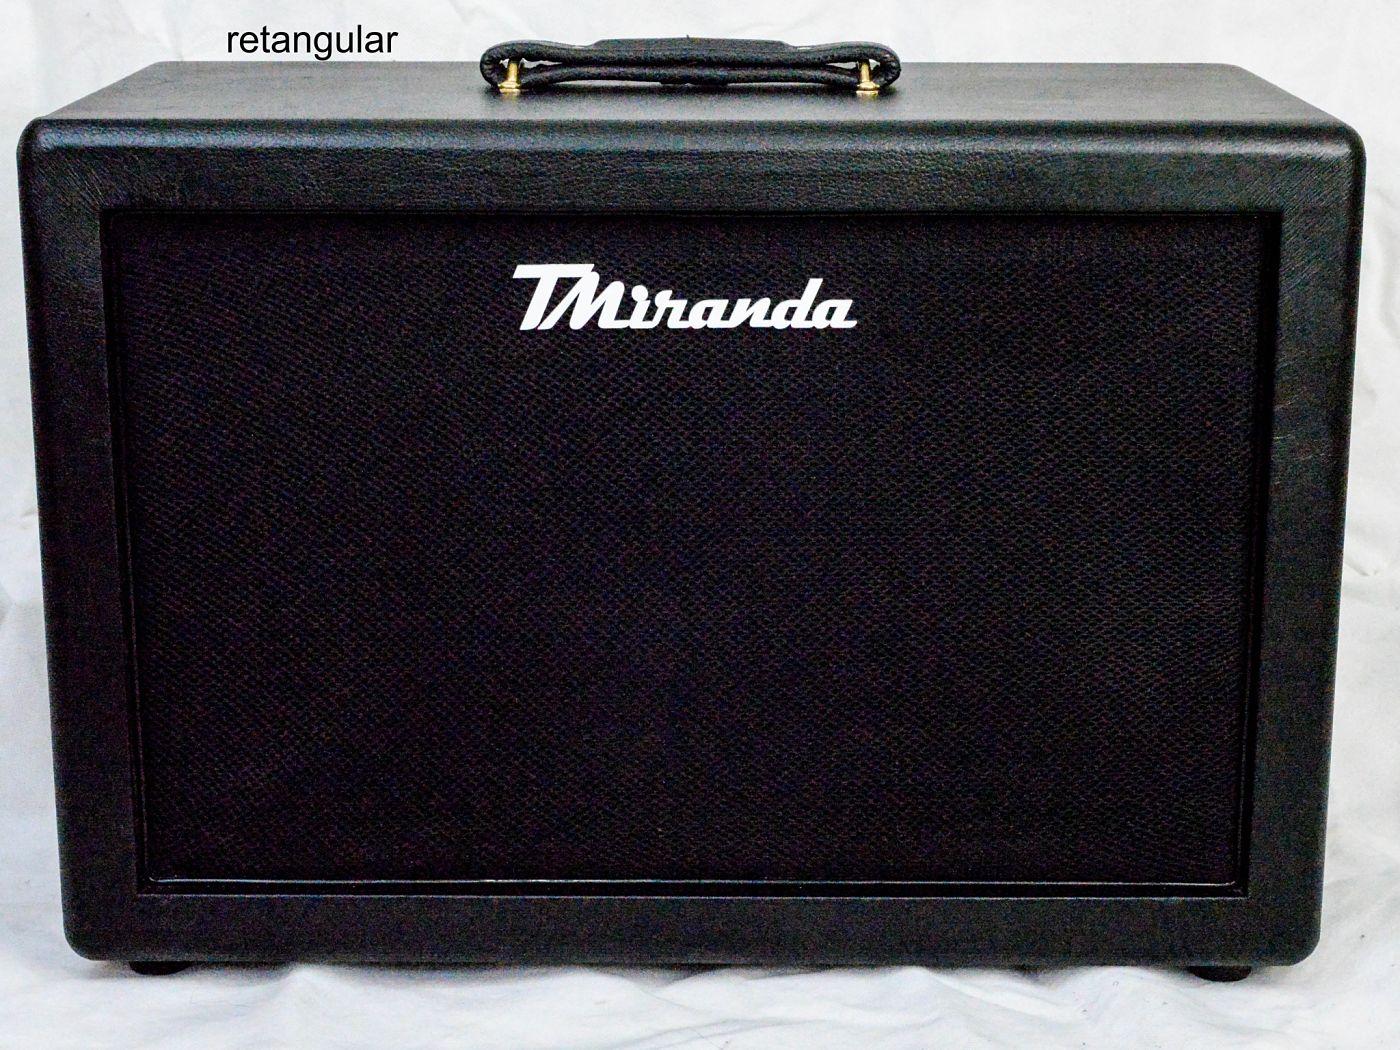 Speaker Cabinet 1x12 black retangular - Amplificadores valvulados & pedais de efeito - TMiranda 1